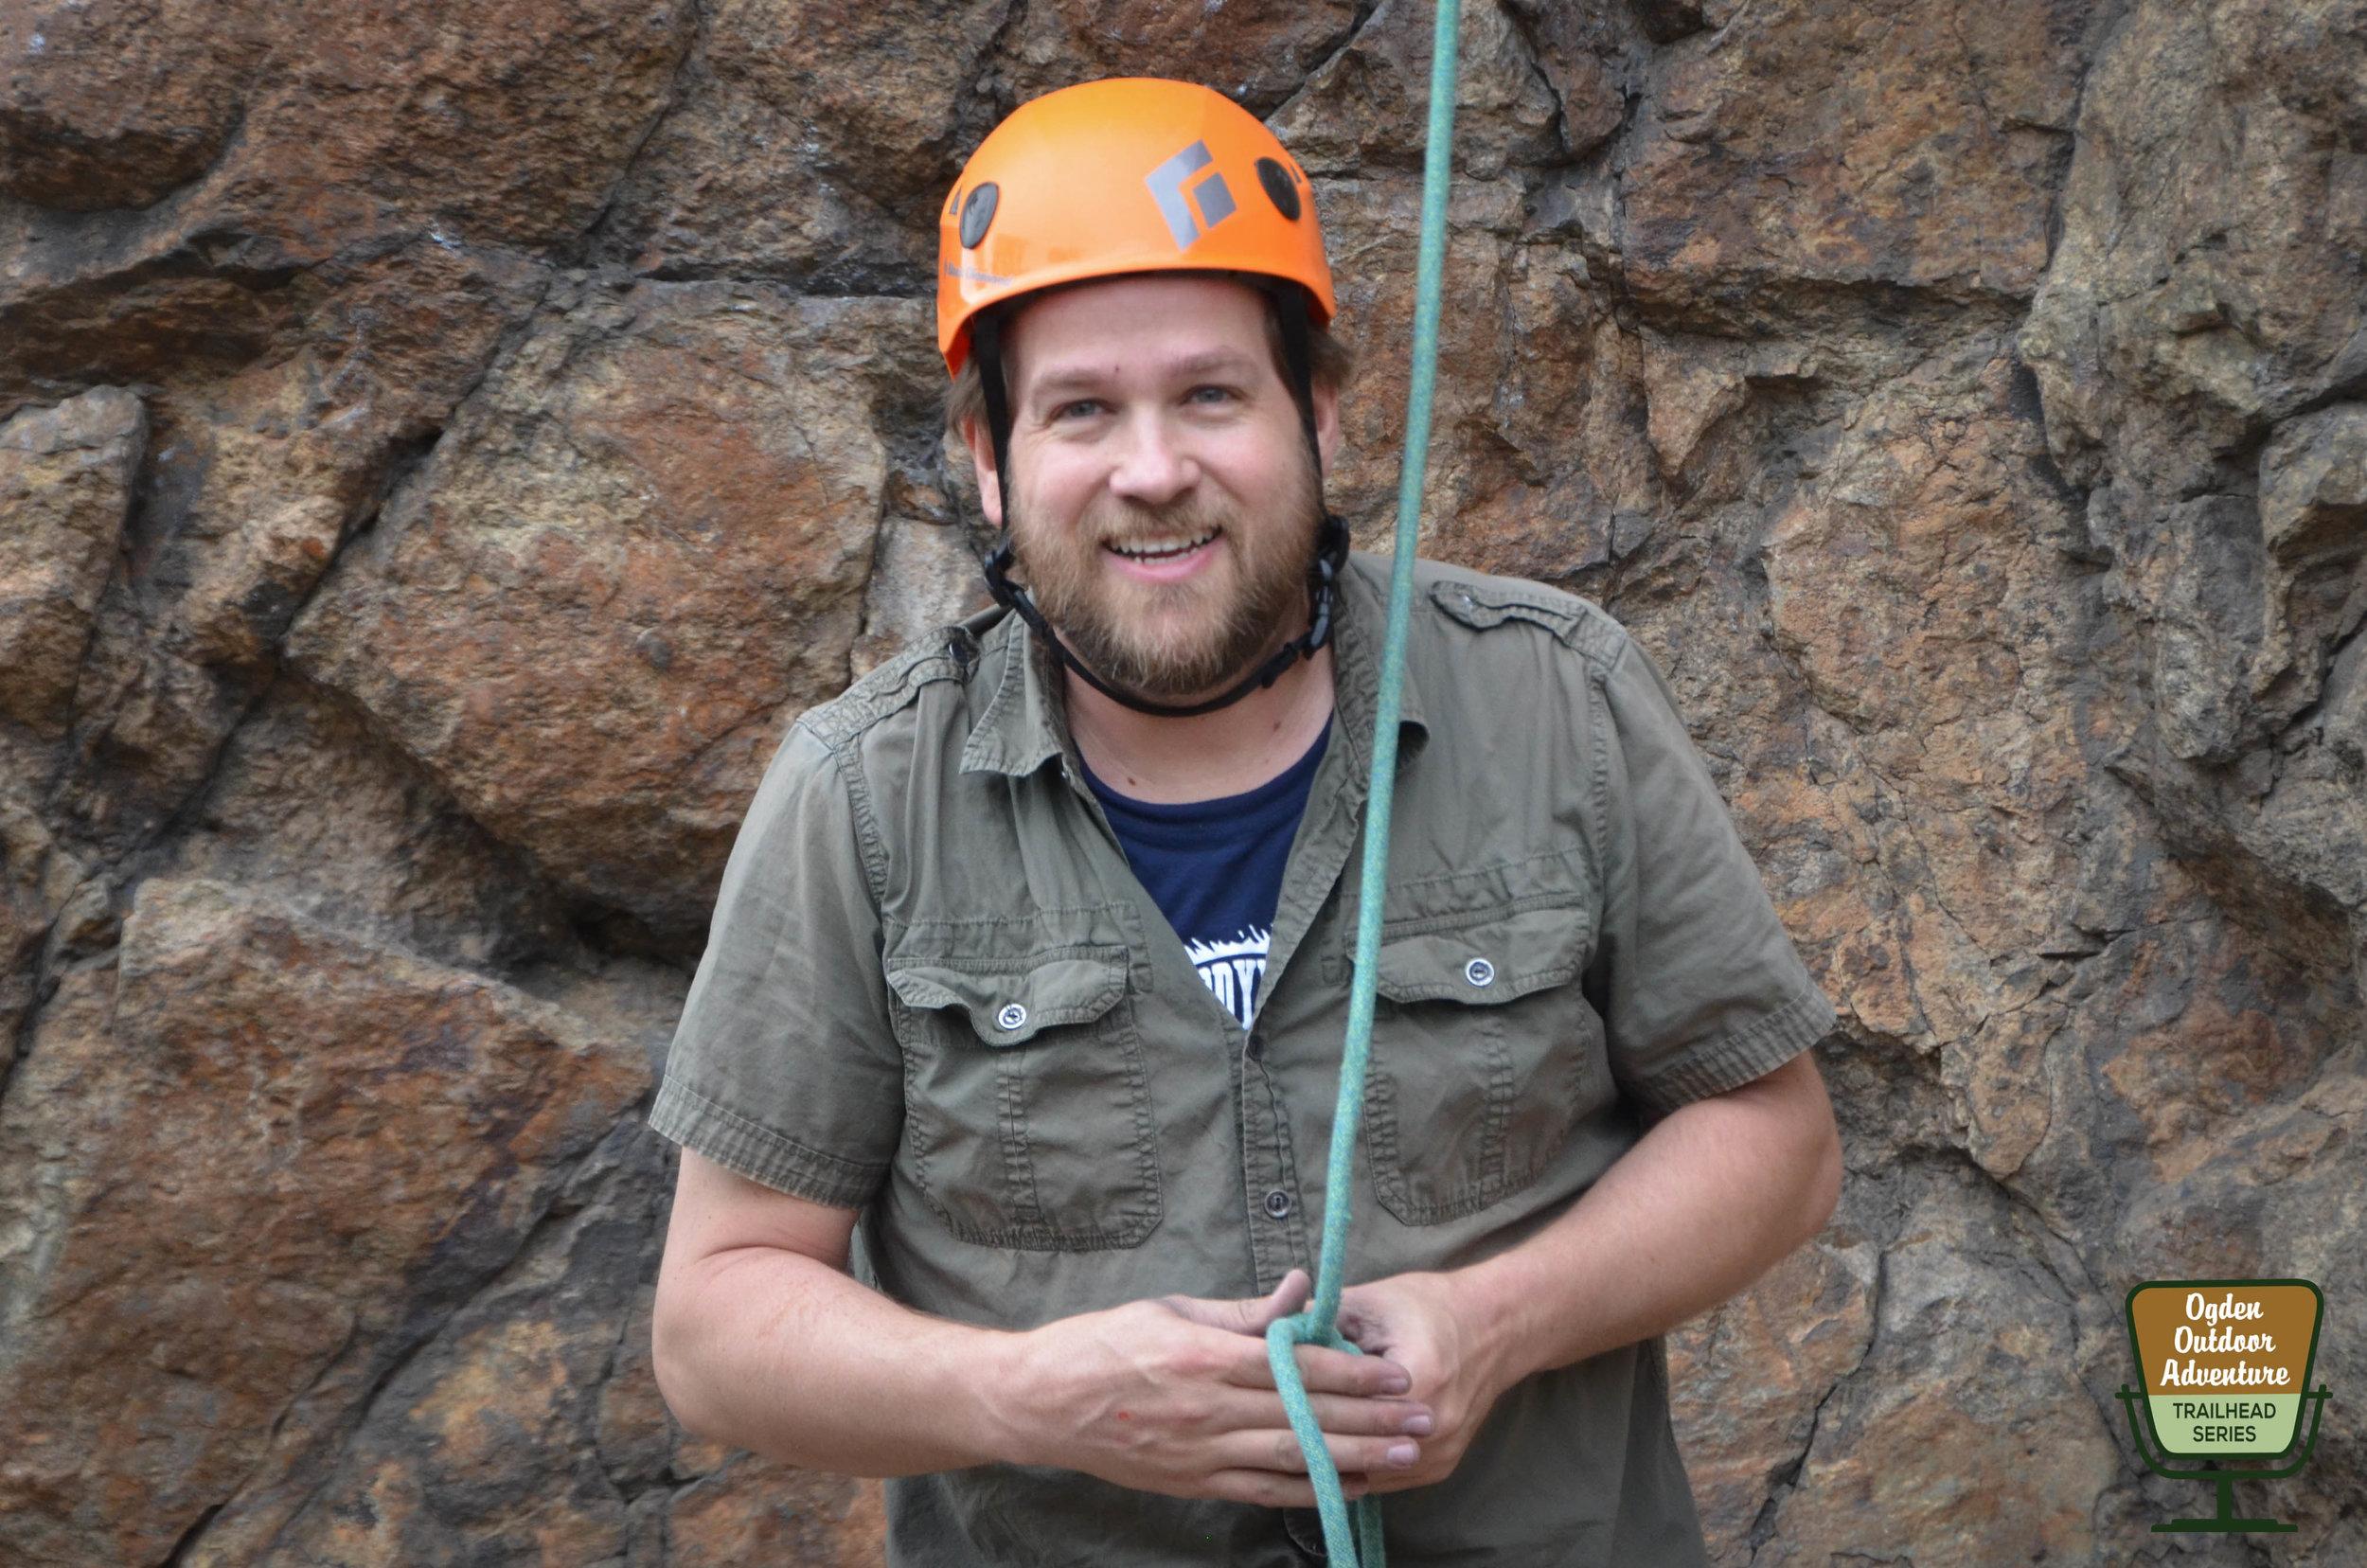 Ogden Outdoor Adventure Show 248 - Bear House Mountaineering-21.jpg